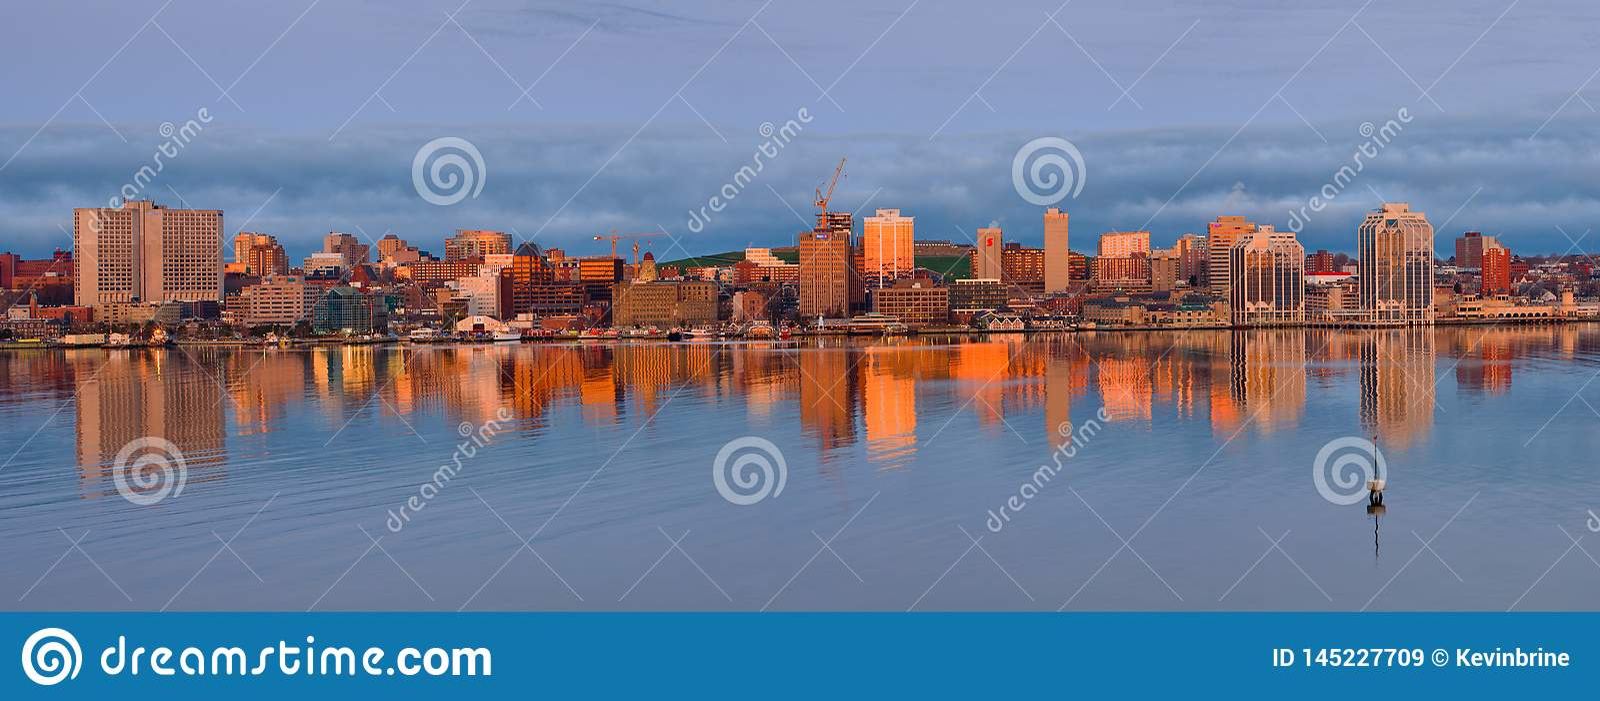 Halifax, Nova Scotia Skyline At Daybreak